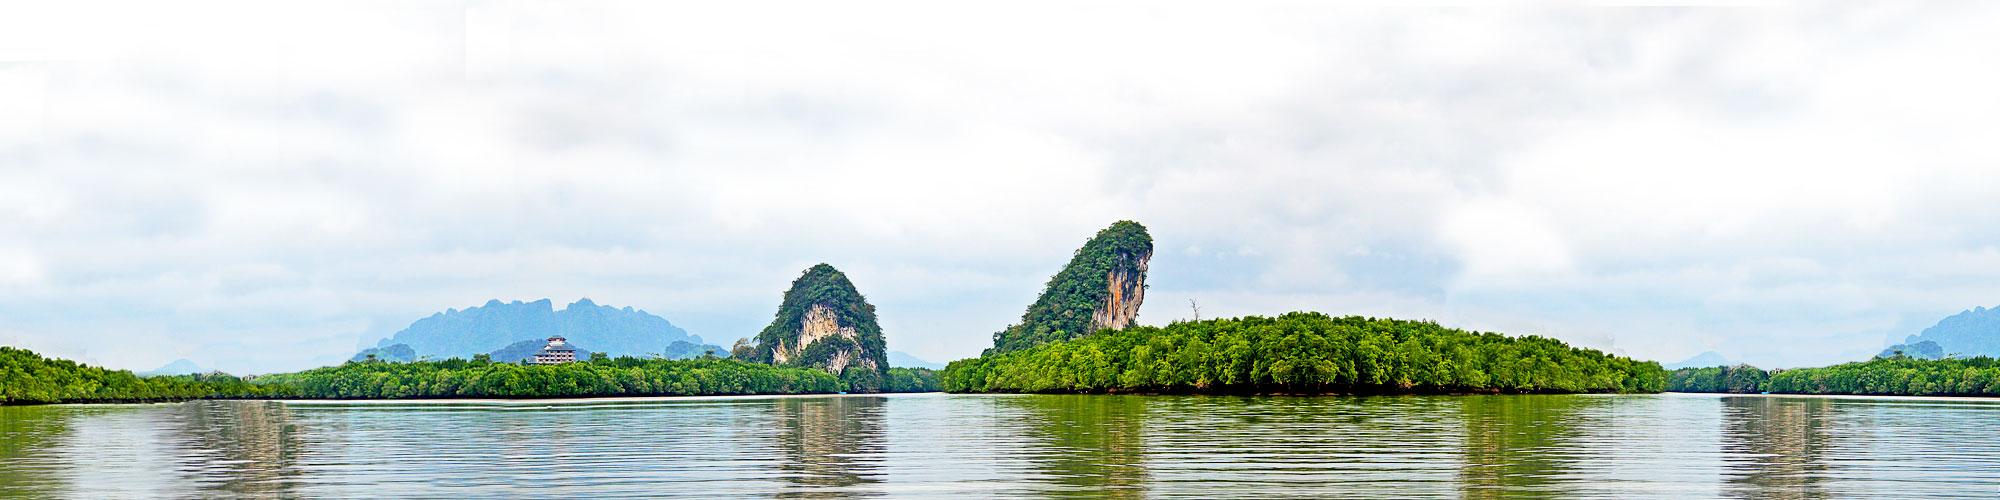 krabi-landscape